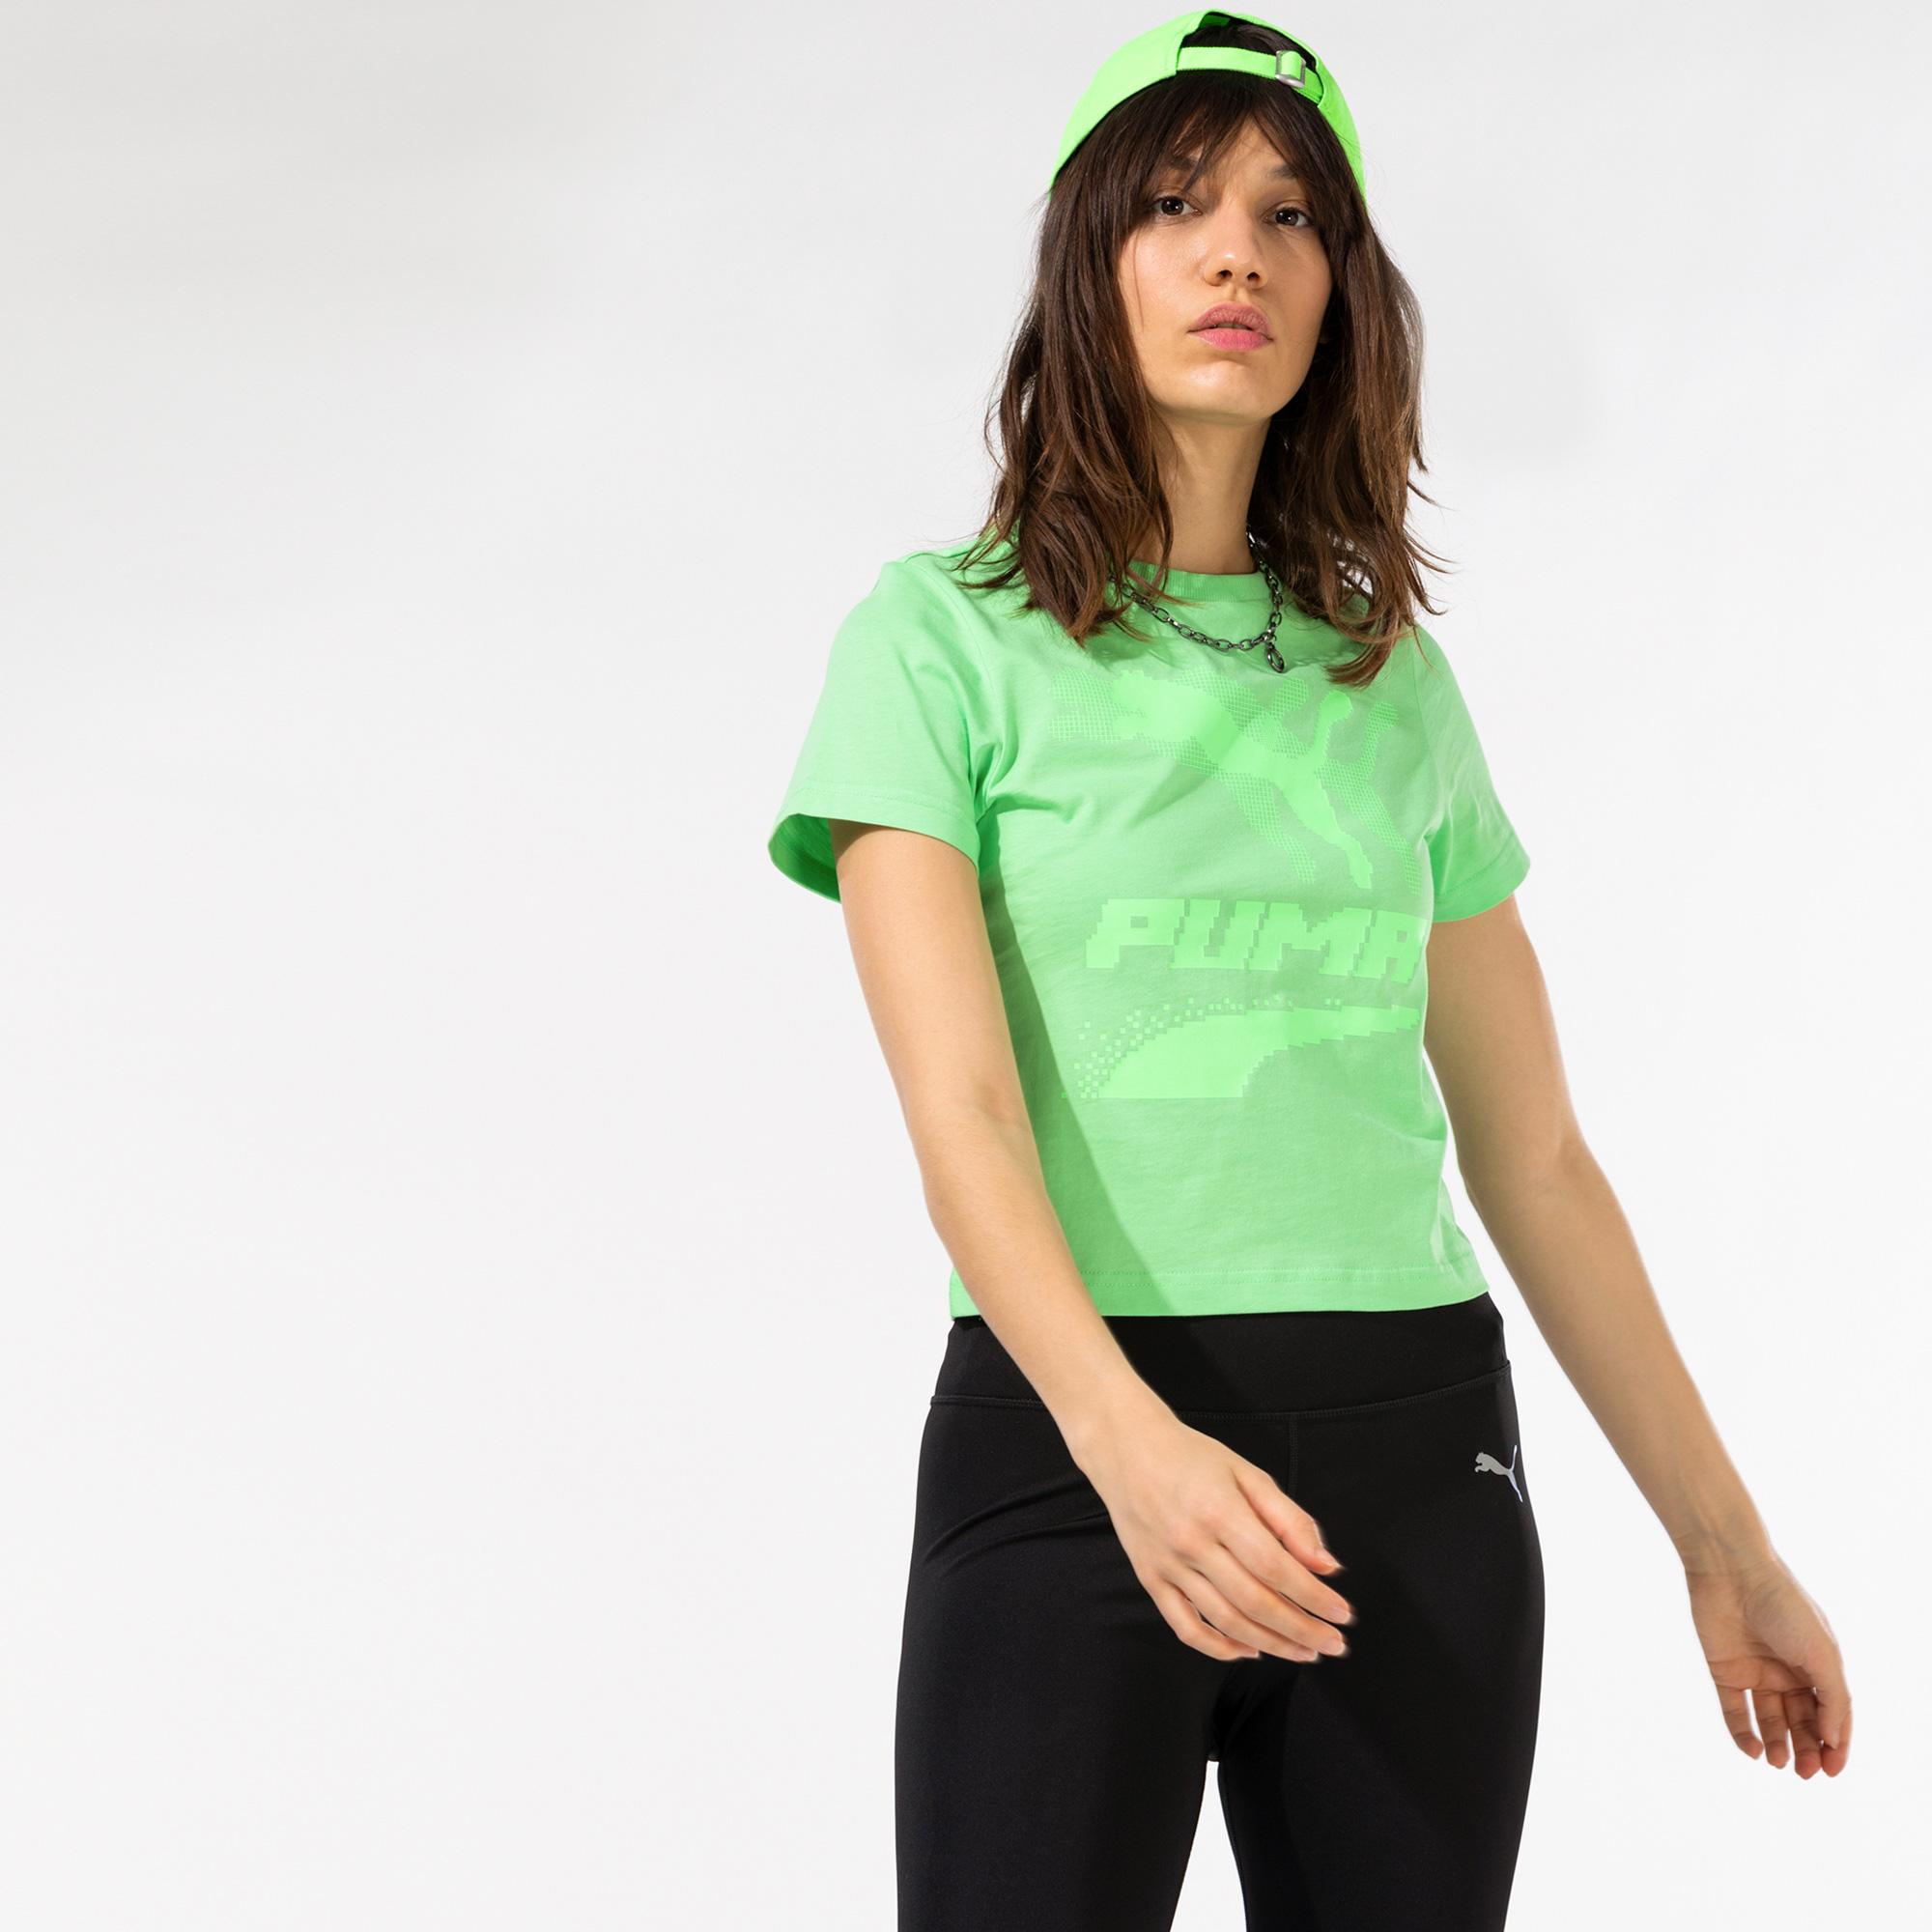 Puma Evide Graphic Kadın Yeşil T-Shirt